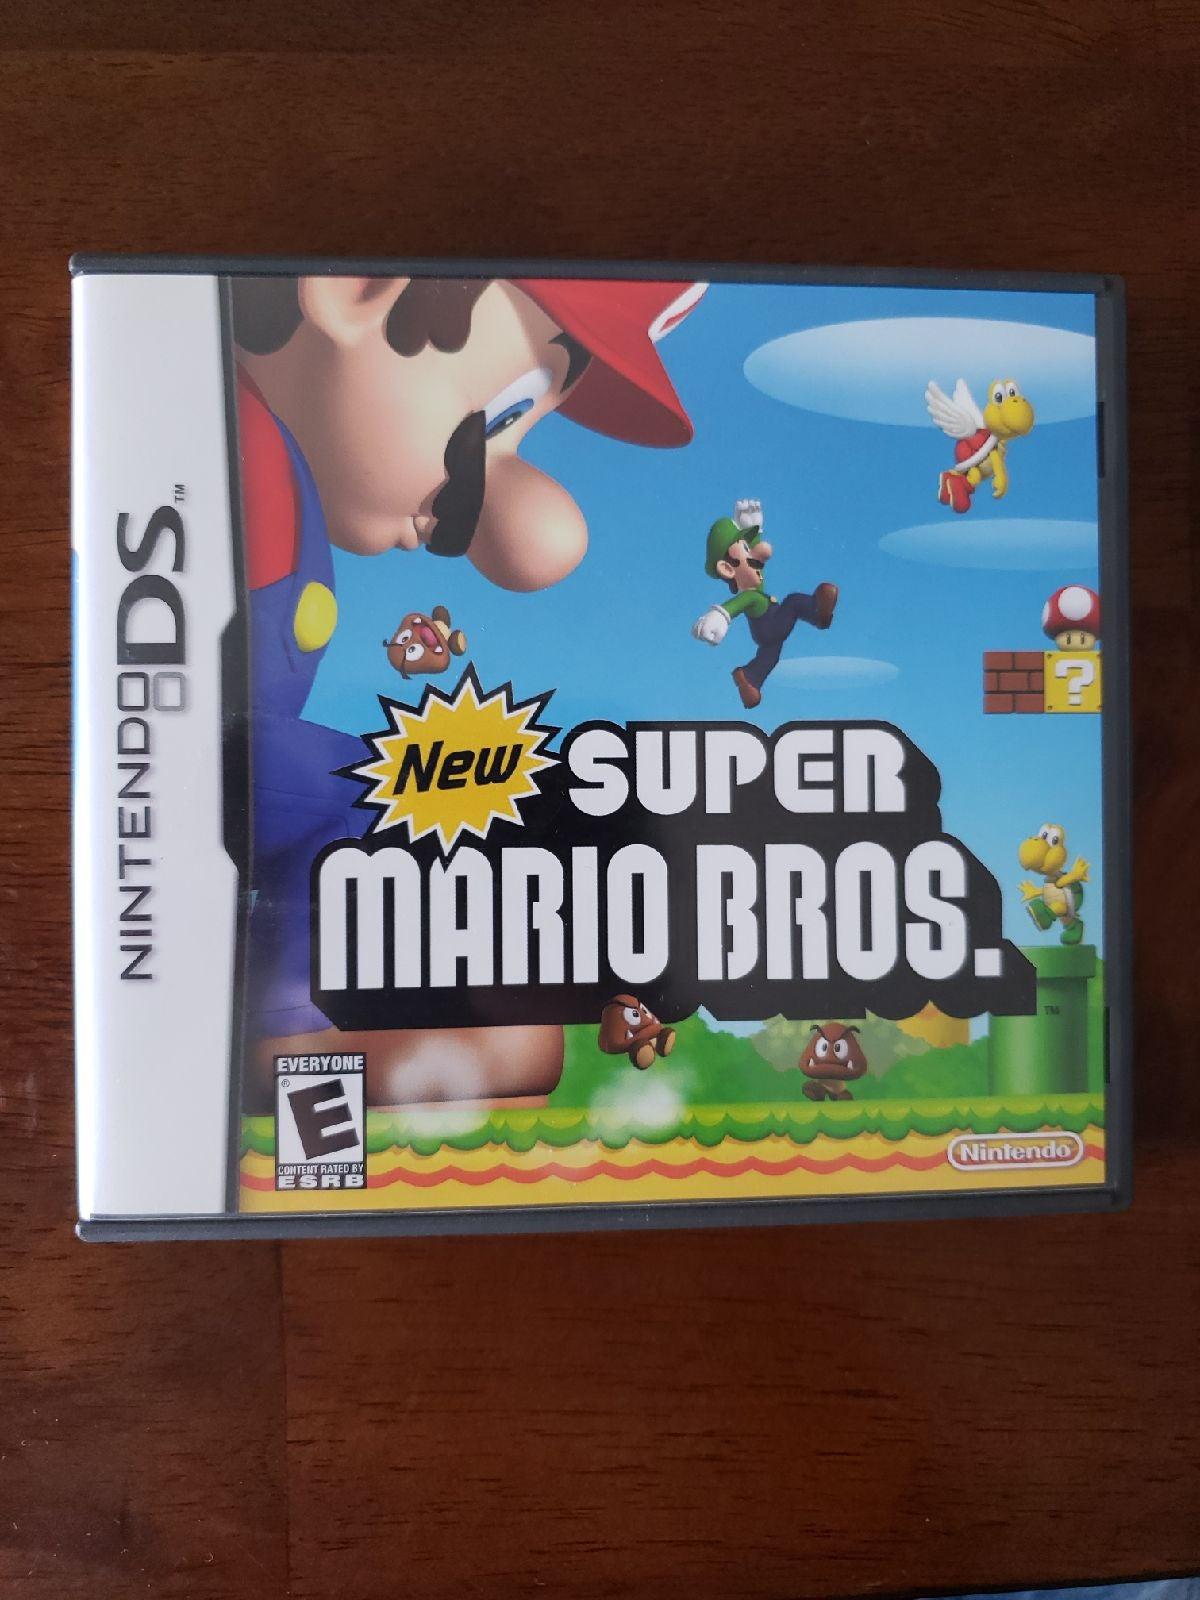 New Super Mario Bros. on Nintendo DS